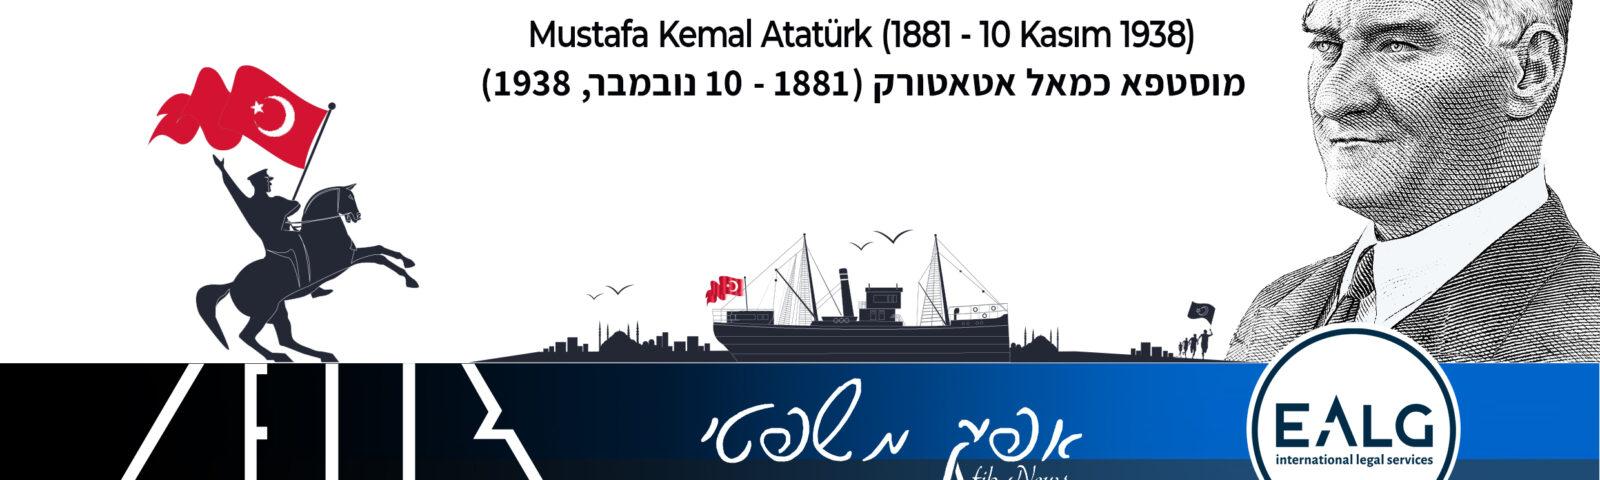 Afik News 335 19.05.2021